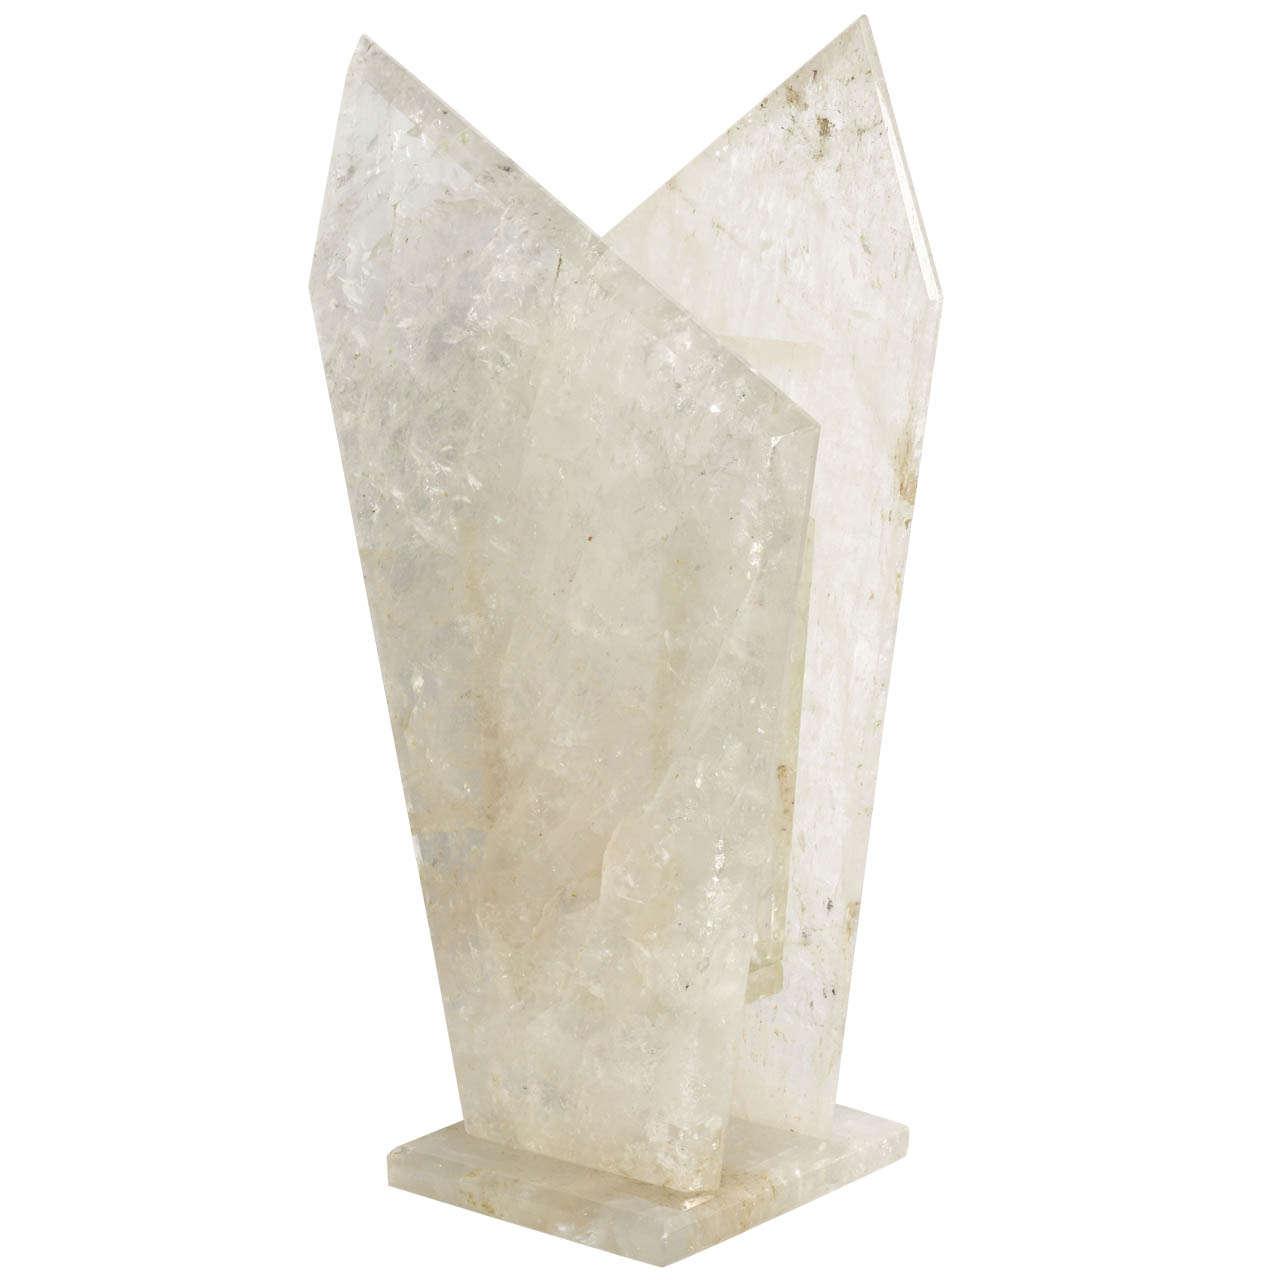 Large and Unusual Rock Crystal Vase